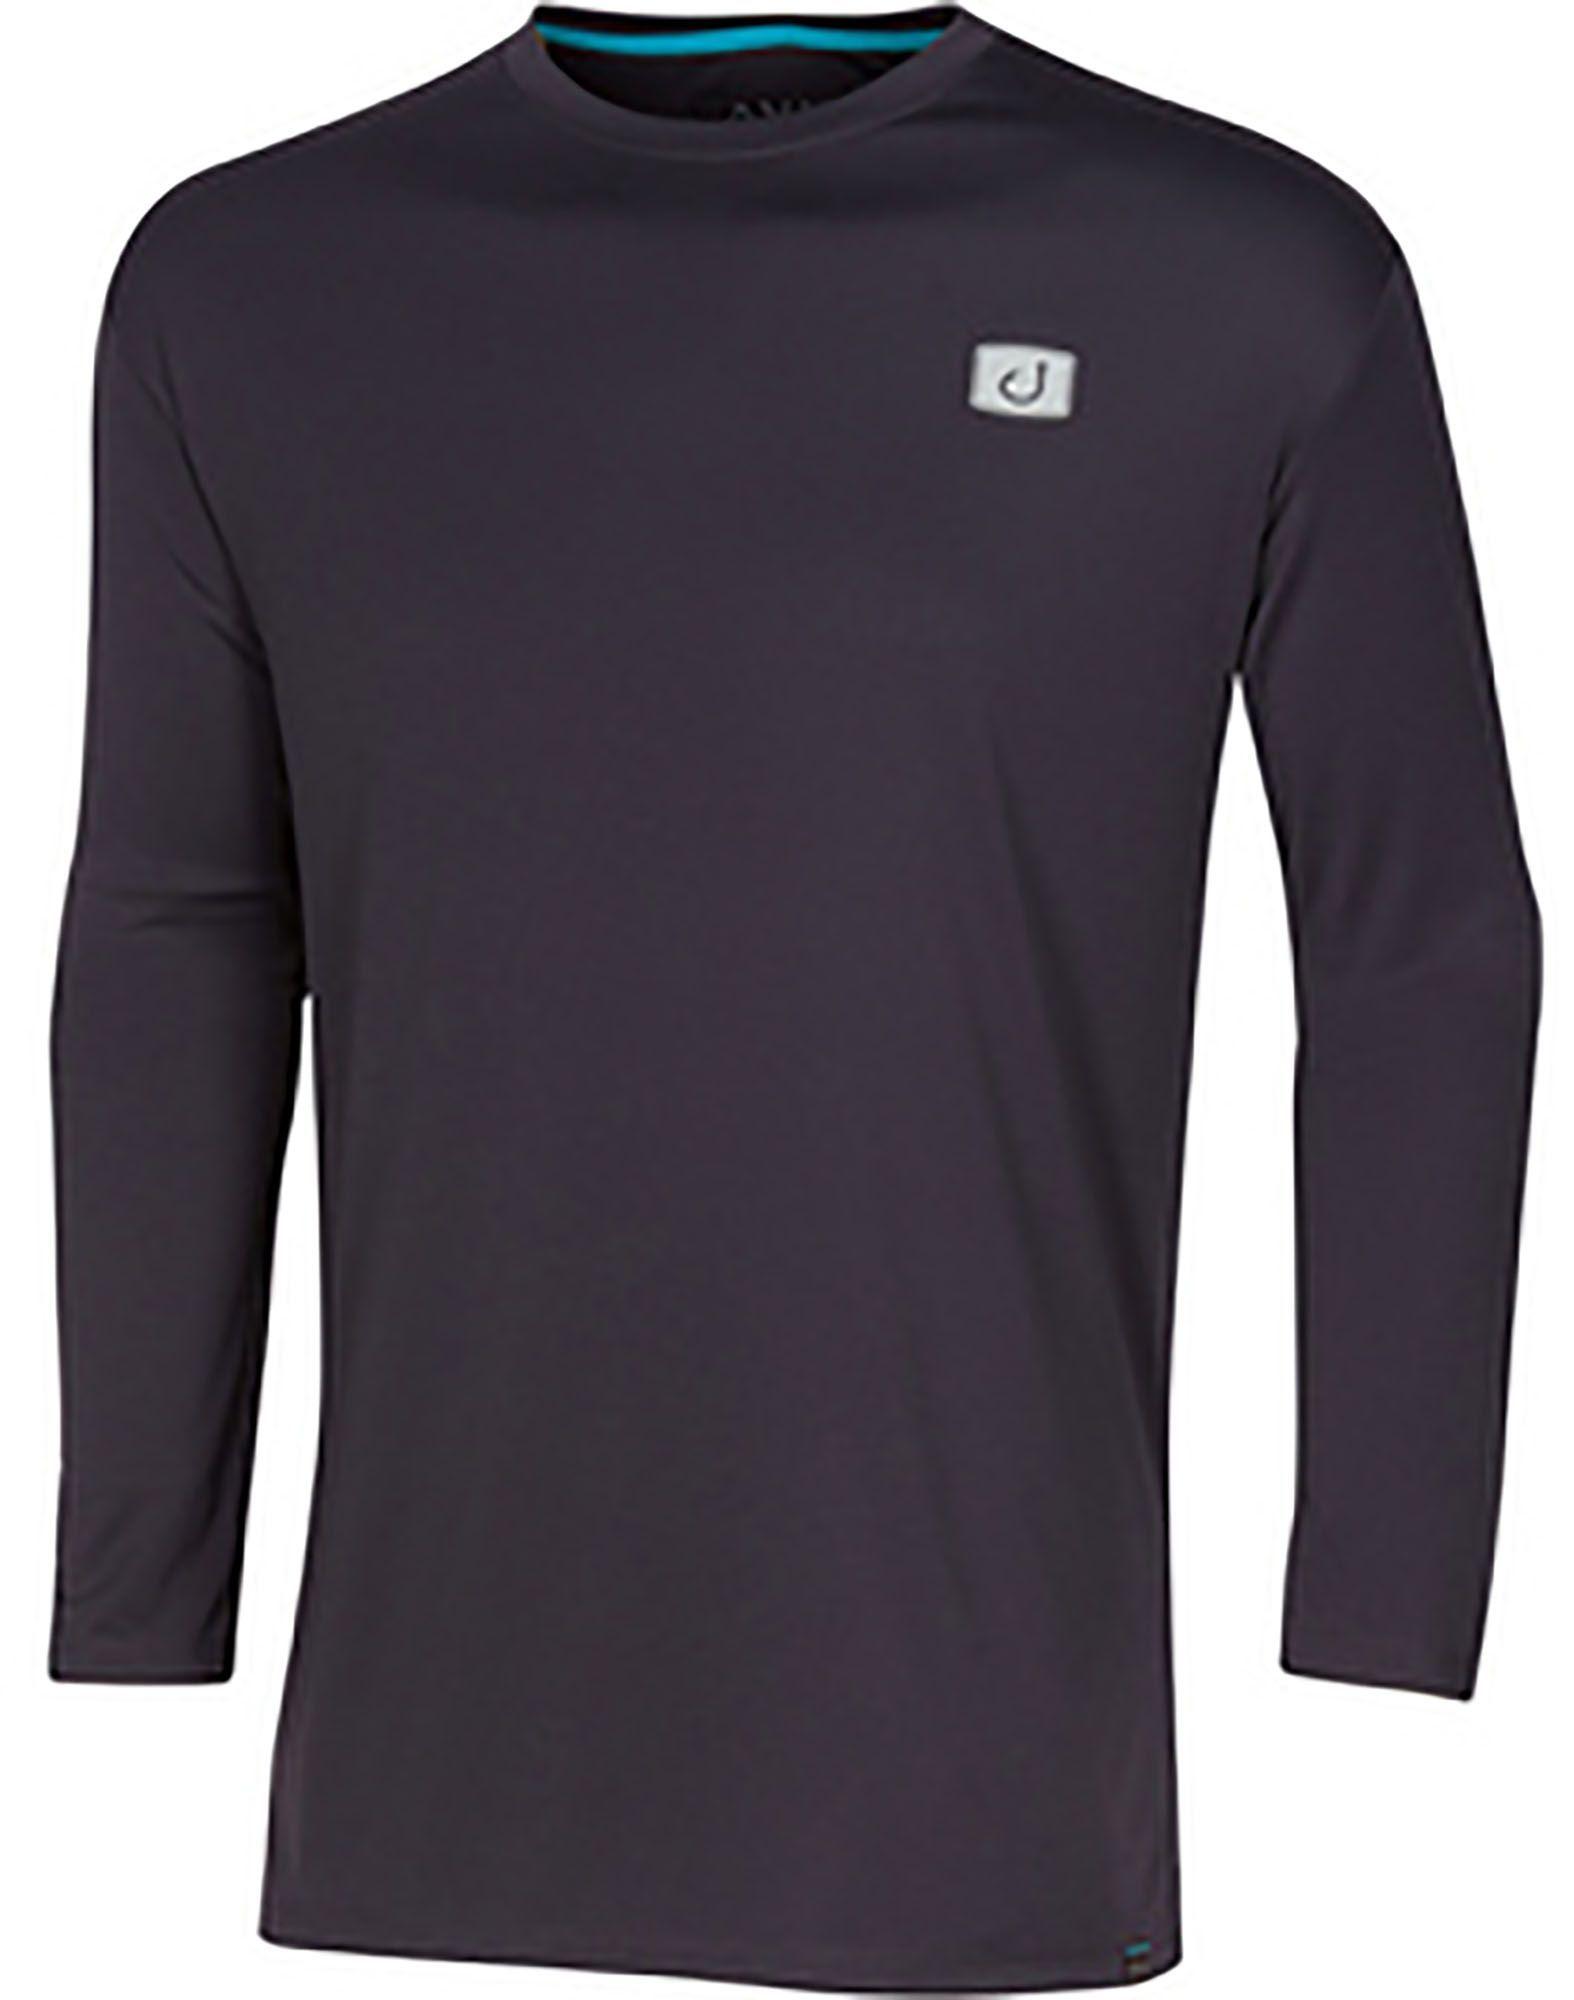 Avid Mens AVIDry Performance Long Sleeve T-Shirt